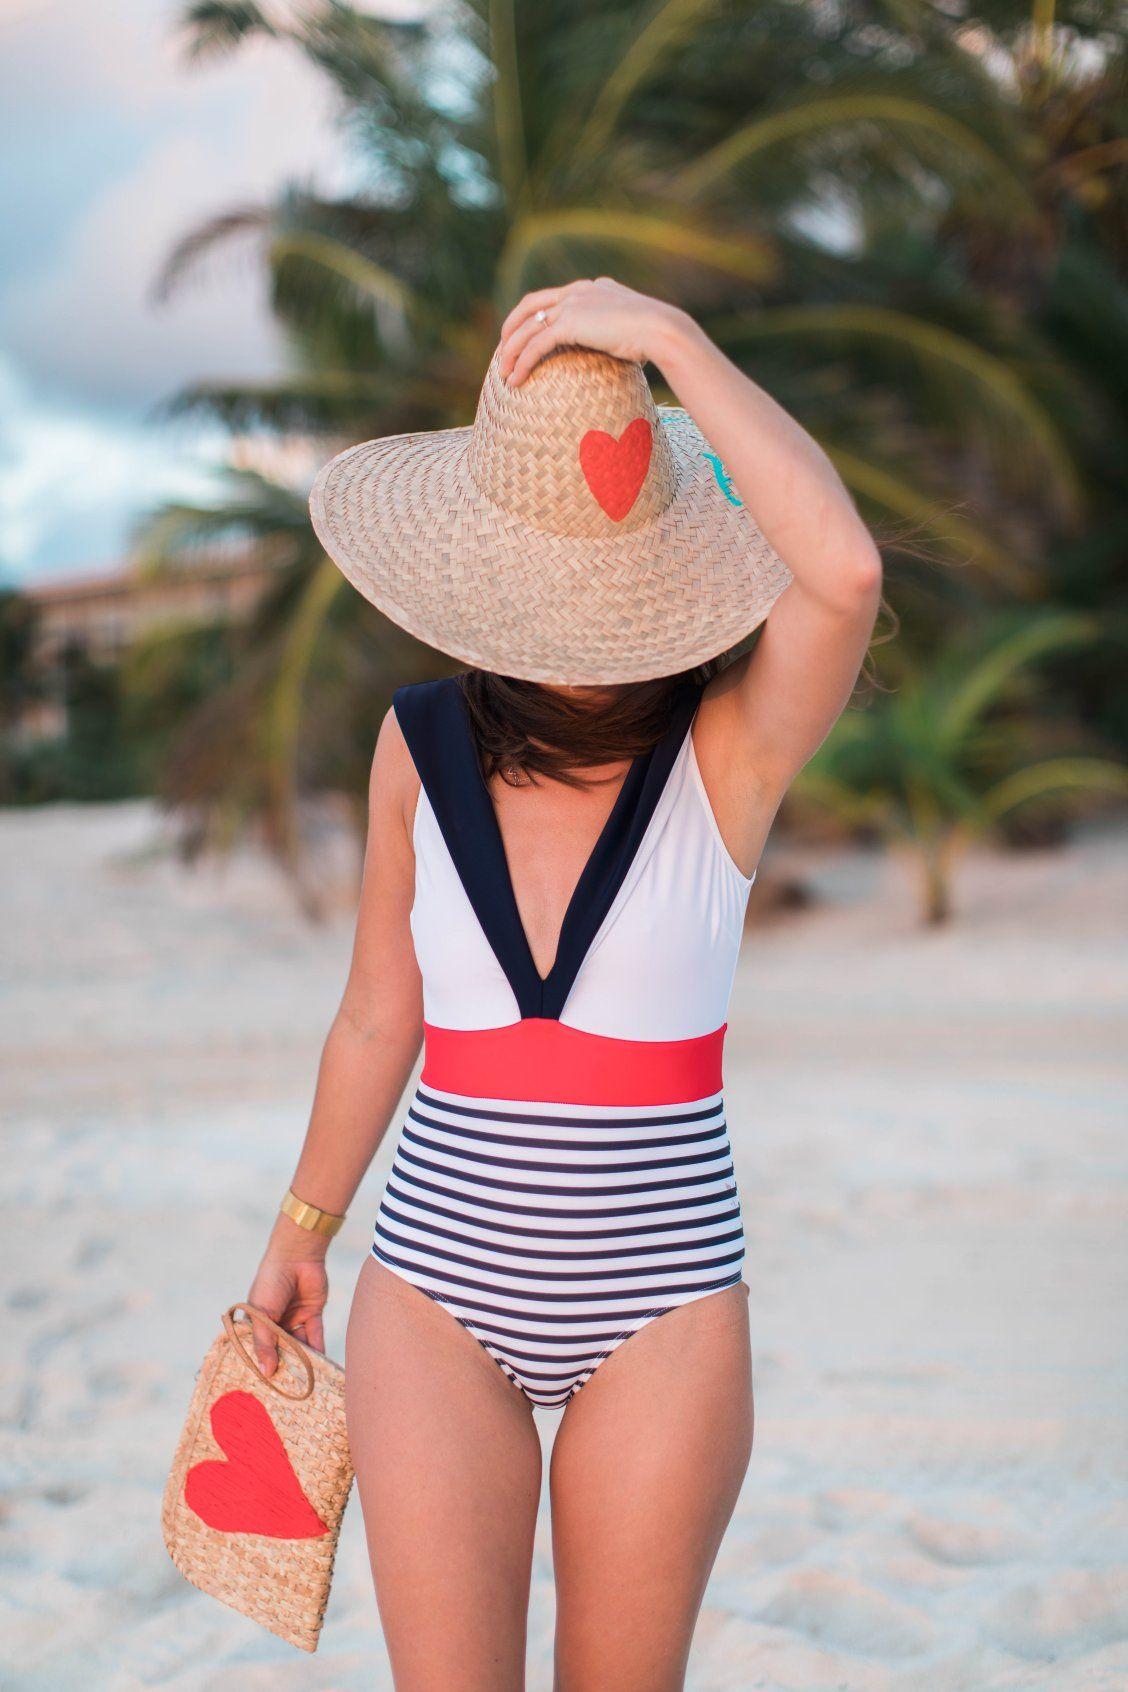 78c9c01b5e81f ModCloth x Jillian Harris in the Nautical One-Piece Swimsuit  nautical   stripes  onepiece  swimsuit  highdive  modcloth